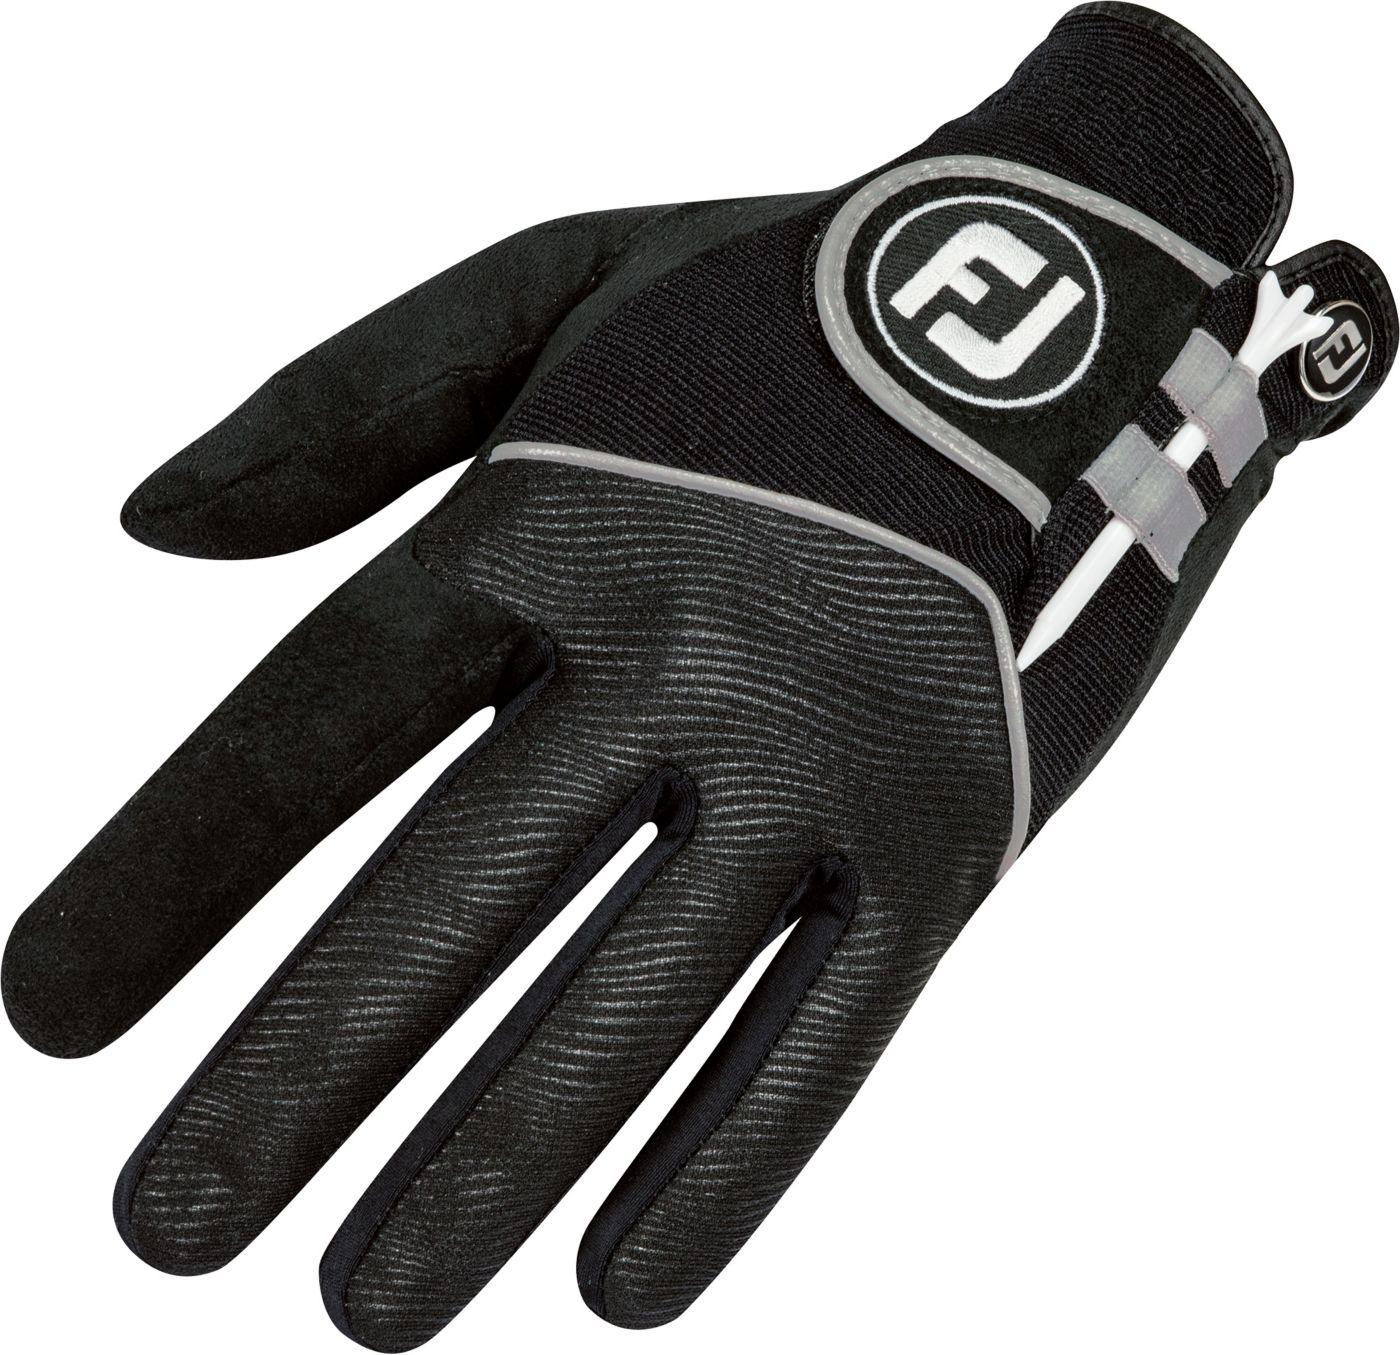 FootJoy RainGrip Golf Gloves – Pair